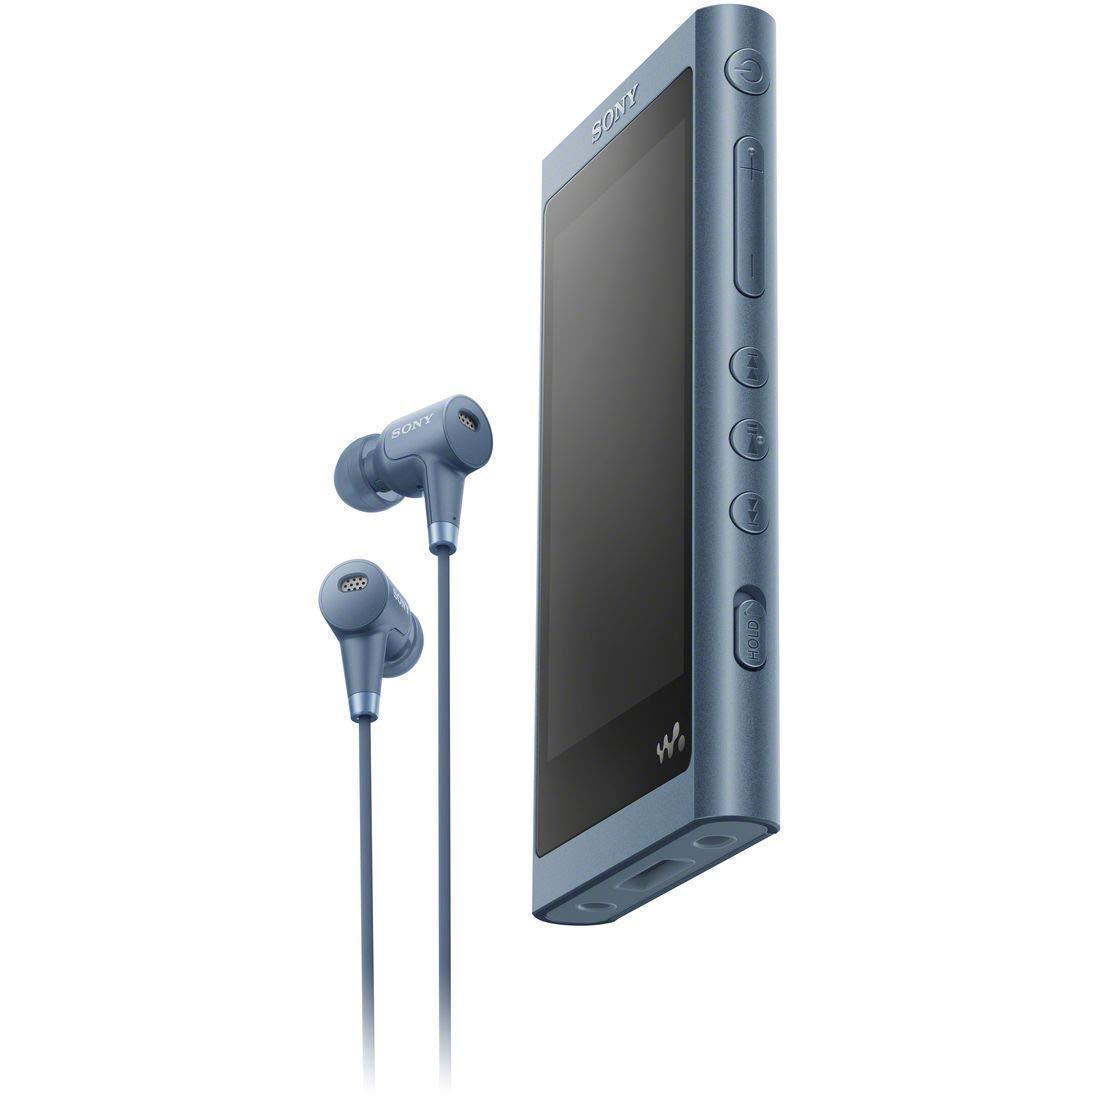 NW-A55HNL Hi-Res Плеер Sony Walkman, 16Gb, цвет синий